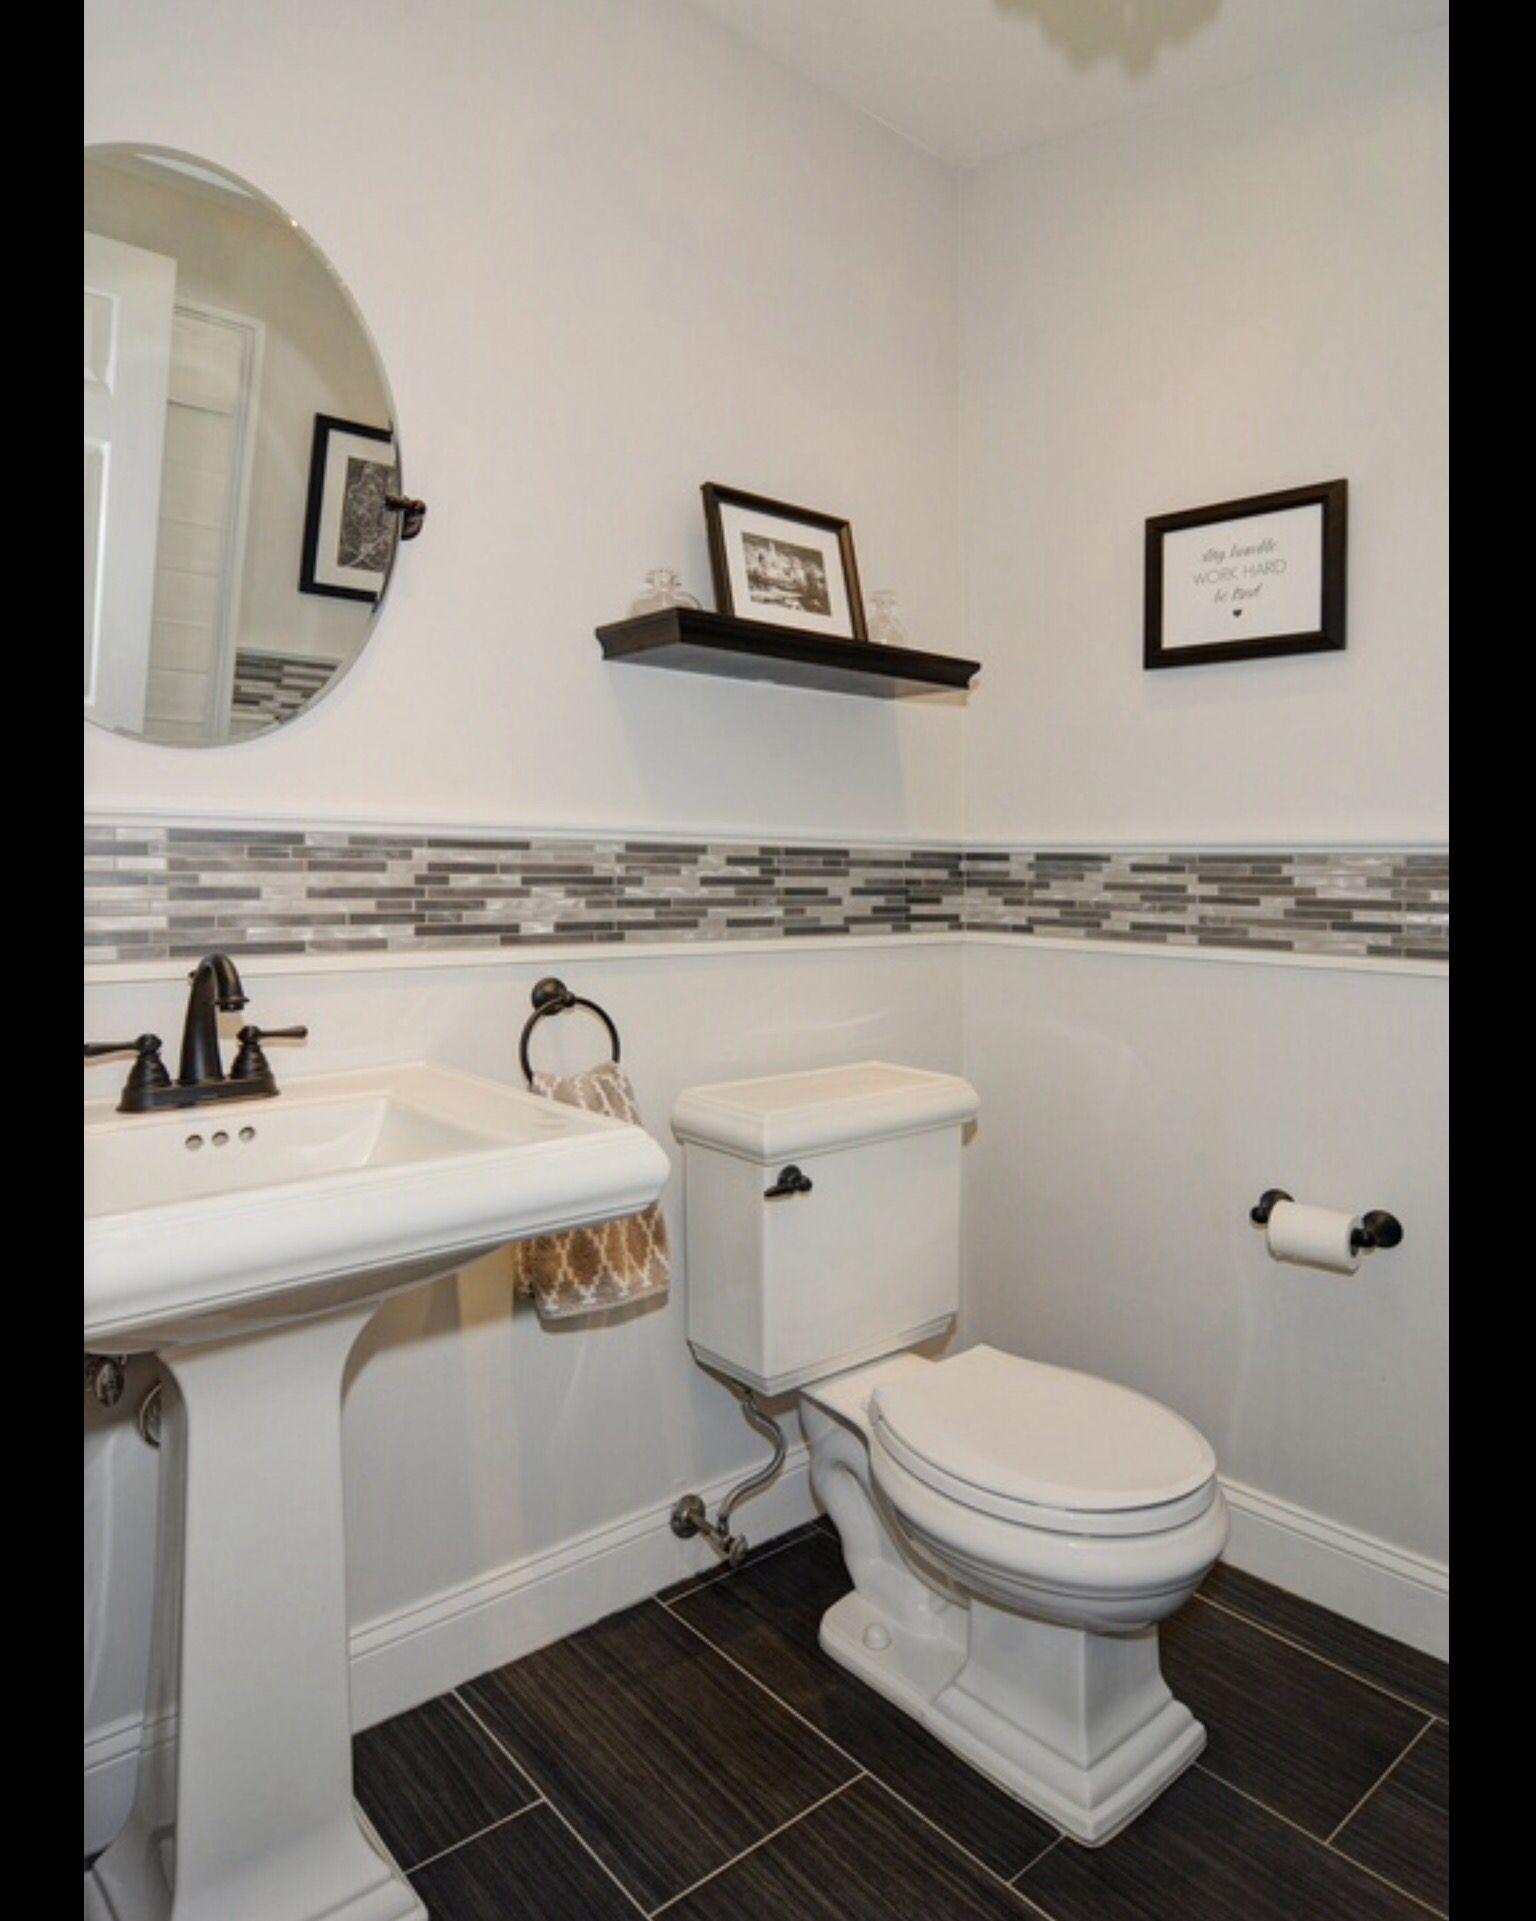 Bathroom Borders Design 2017: Like The Tile Border And The Floor